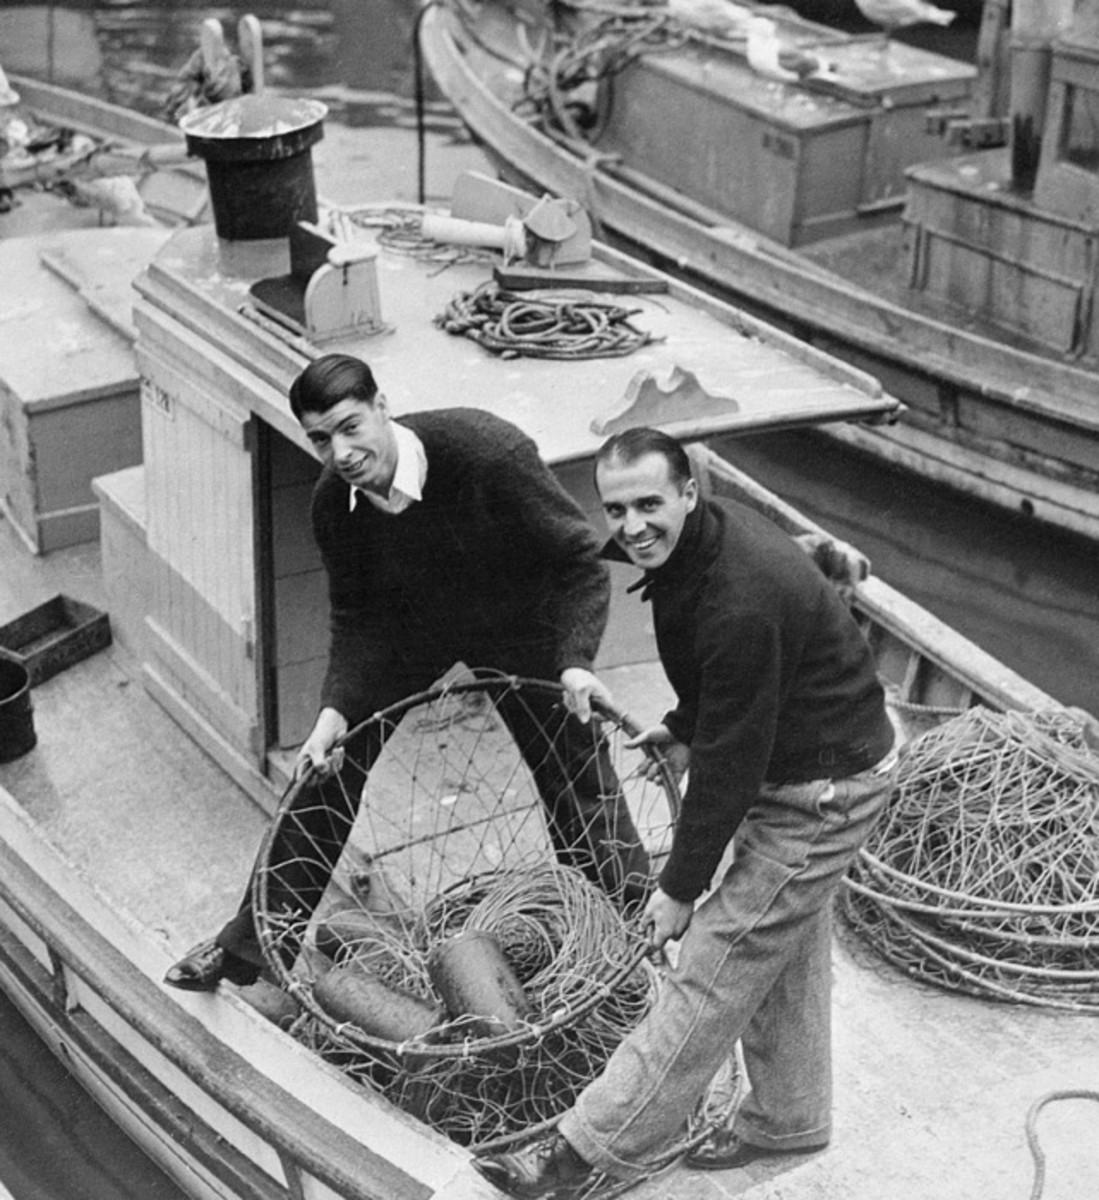 Joe DiMaggio and Frank Crosetti